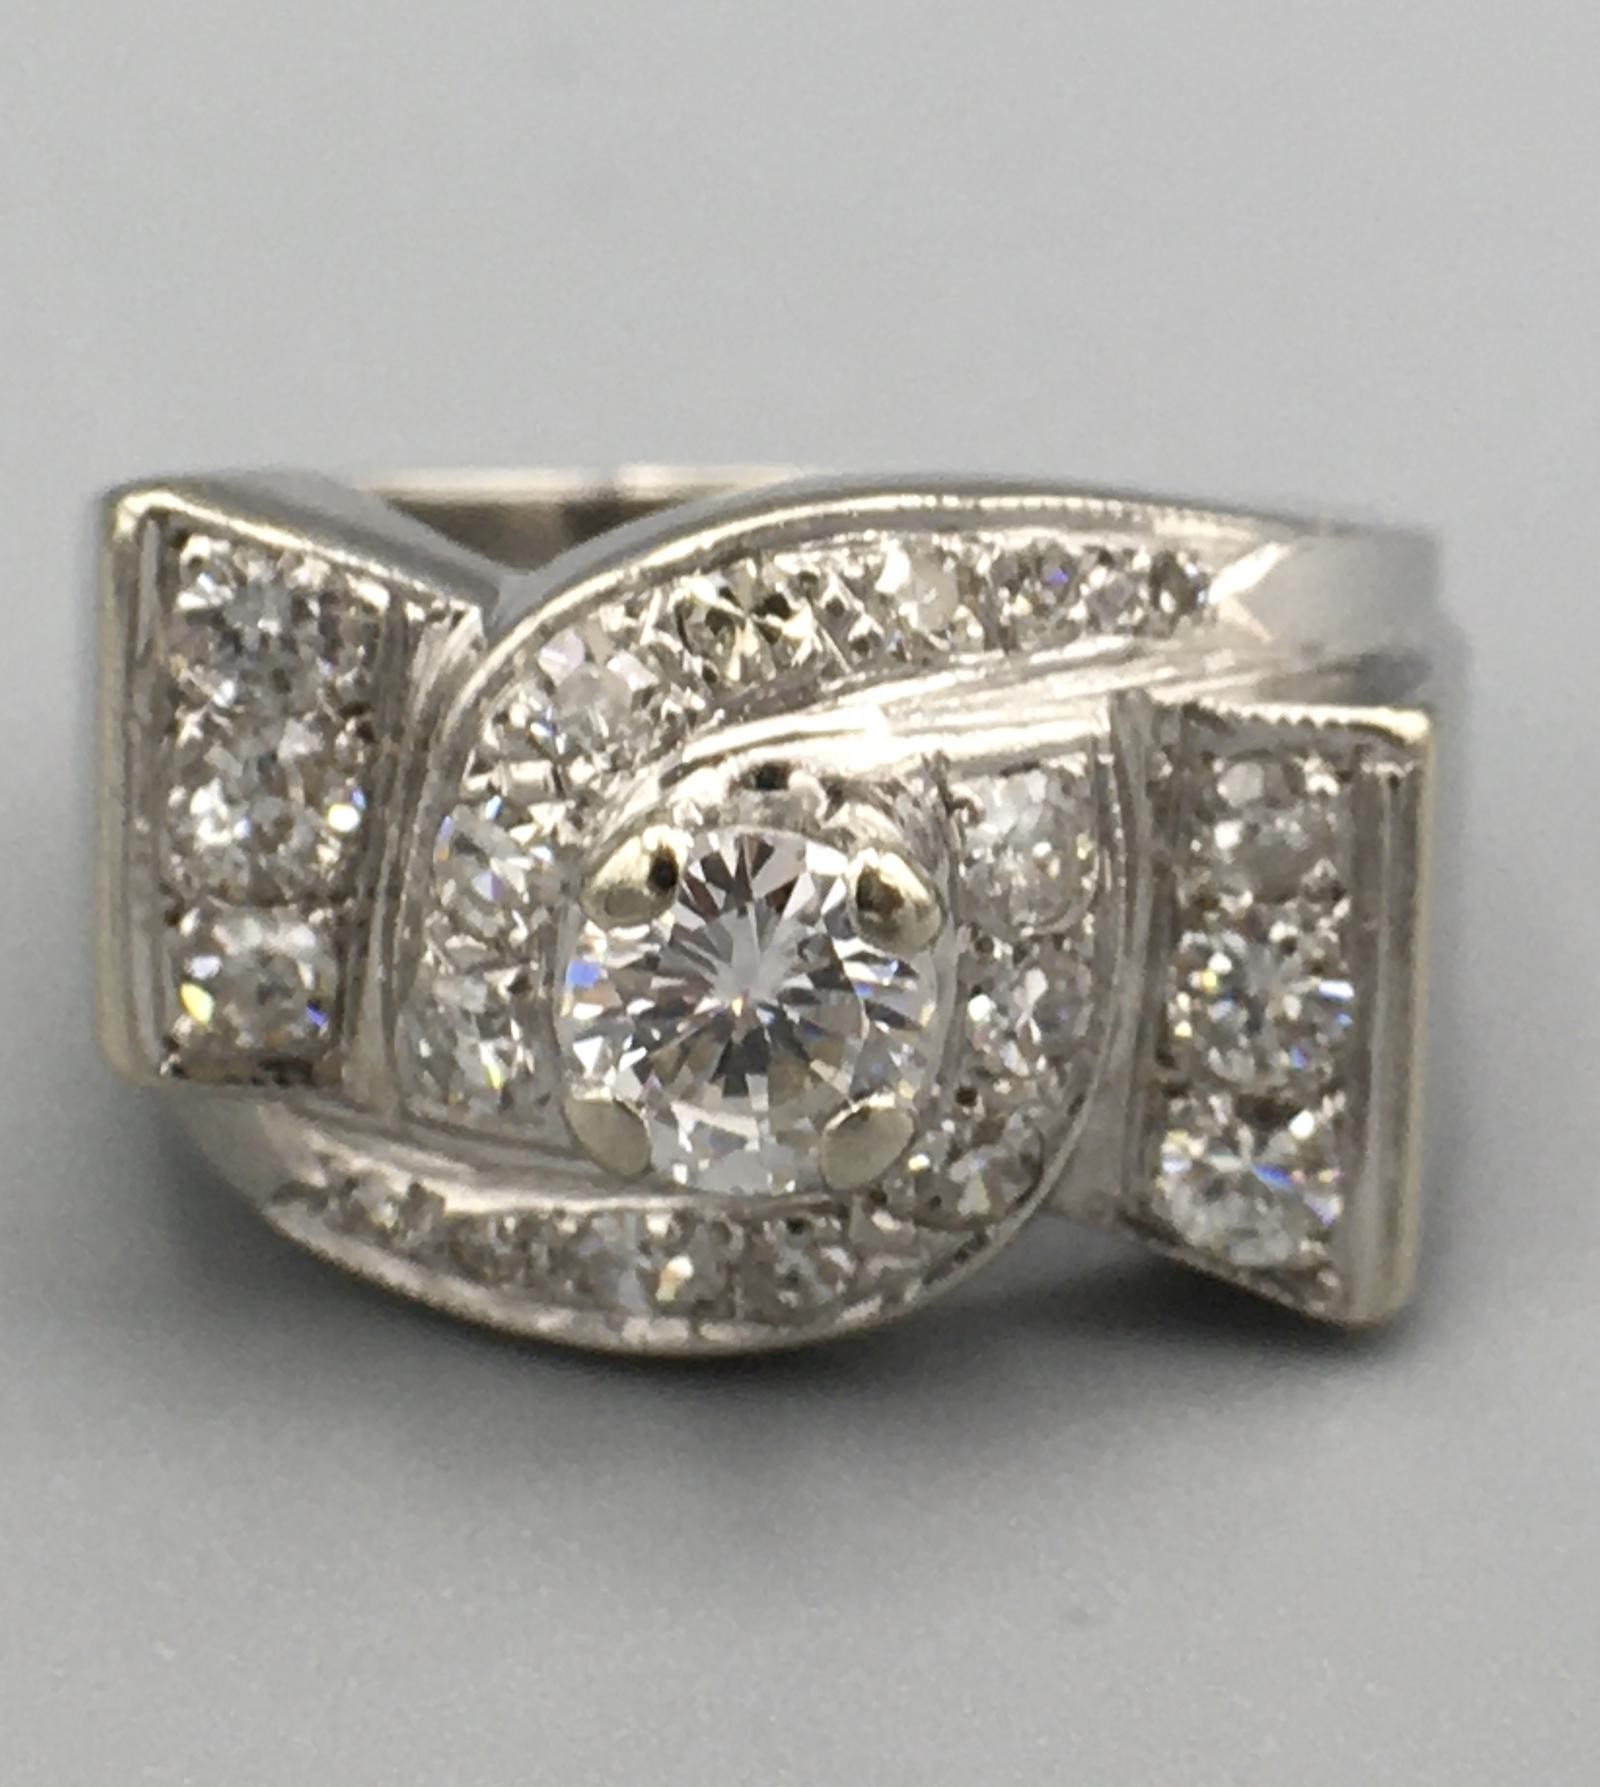 Teresa Brill Jewellery Ltd image (4 of 4)